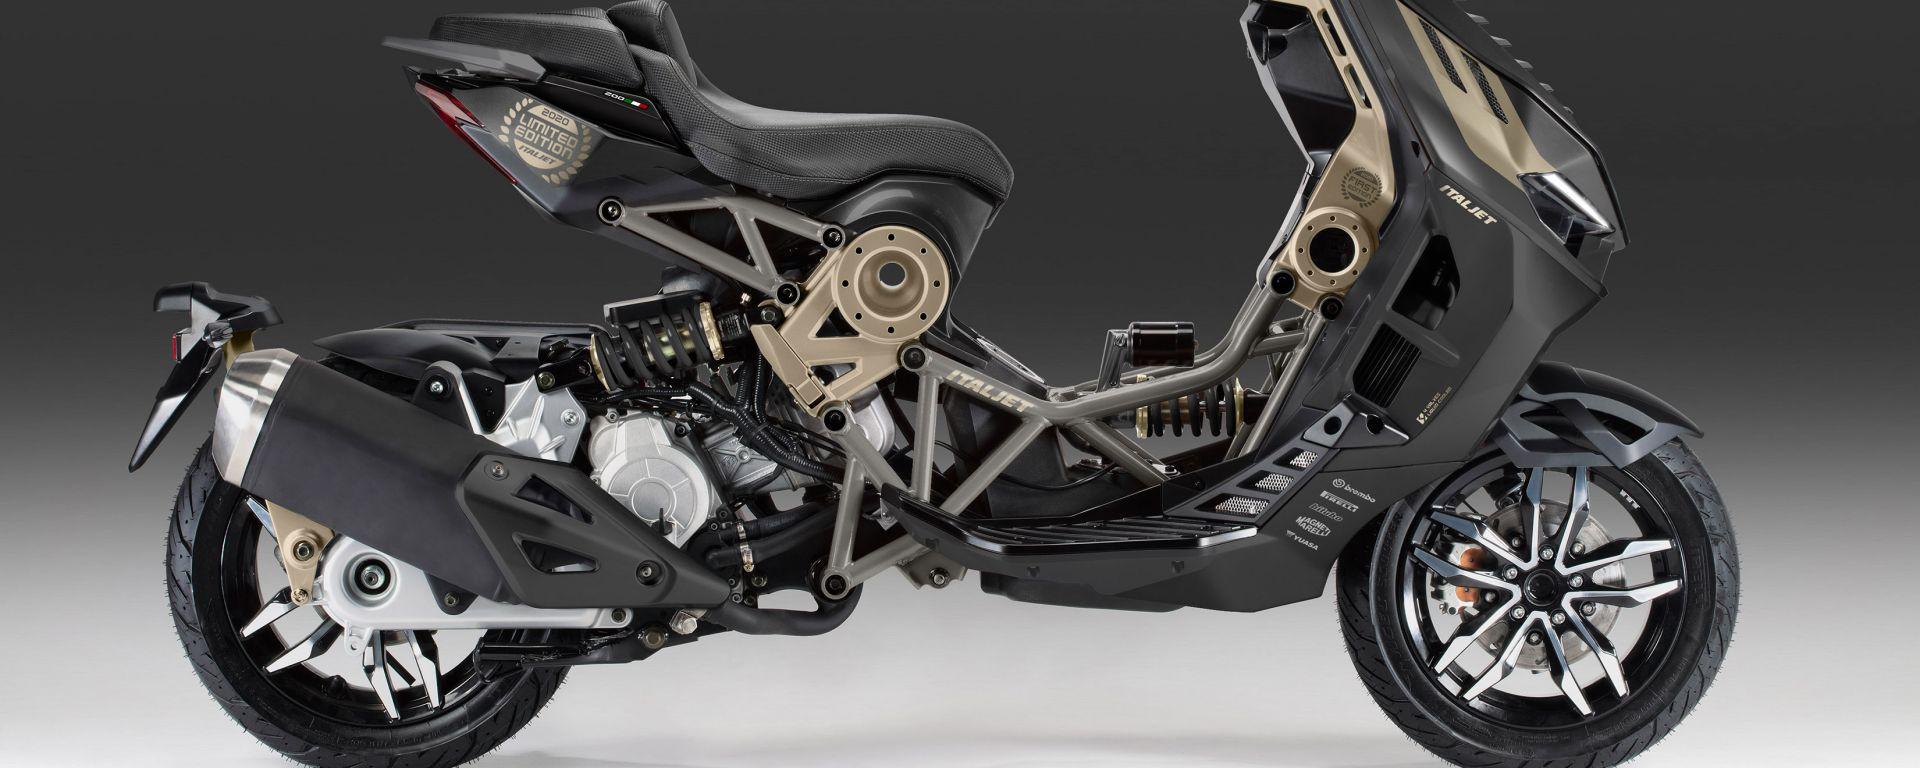 Italjet Dragster Limited Edition, livrea Black Magnesium